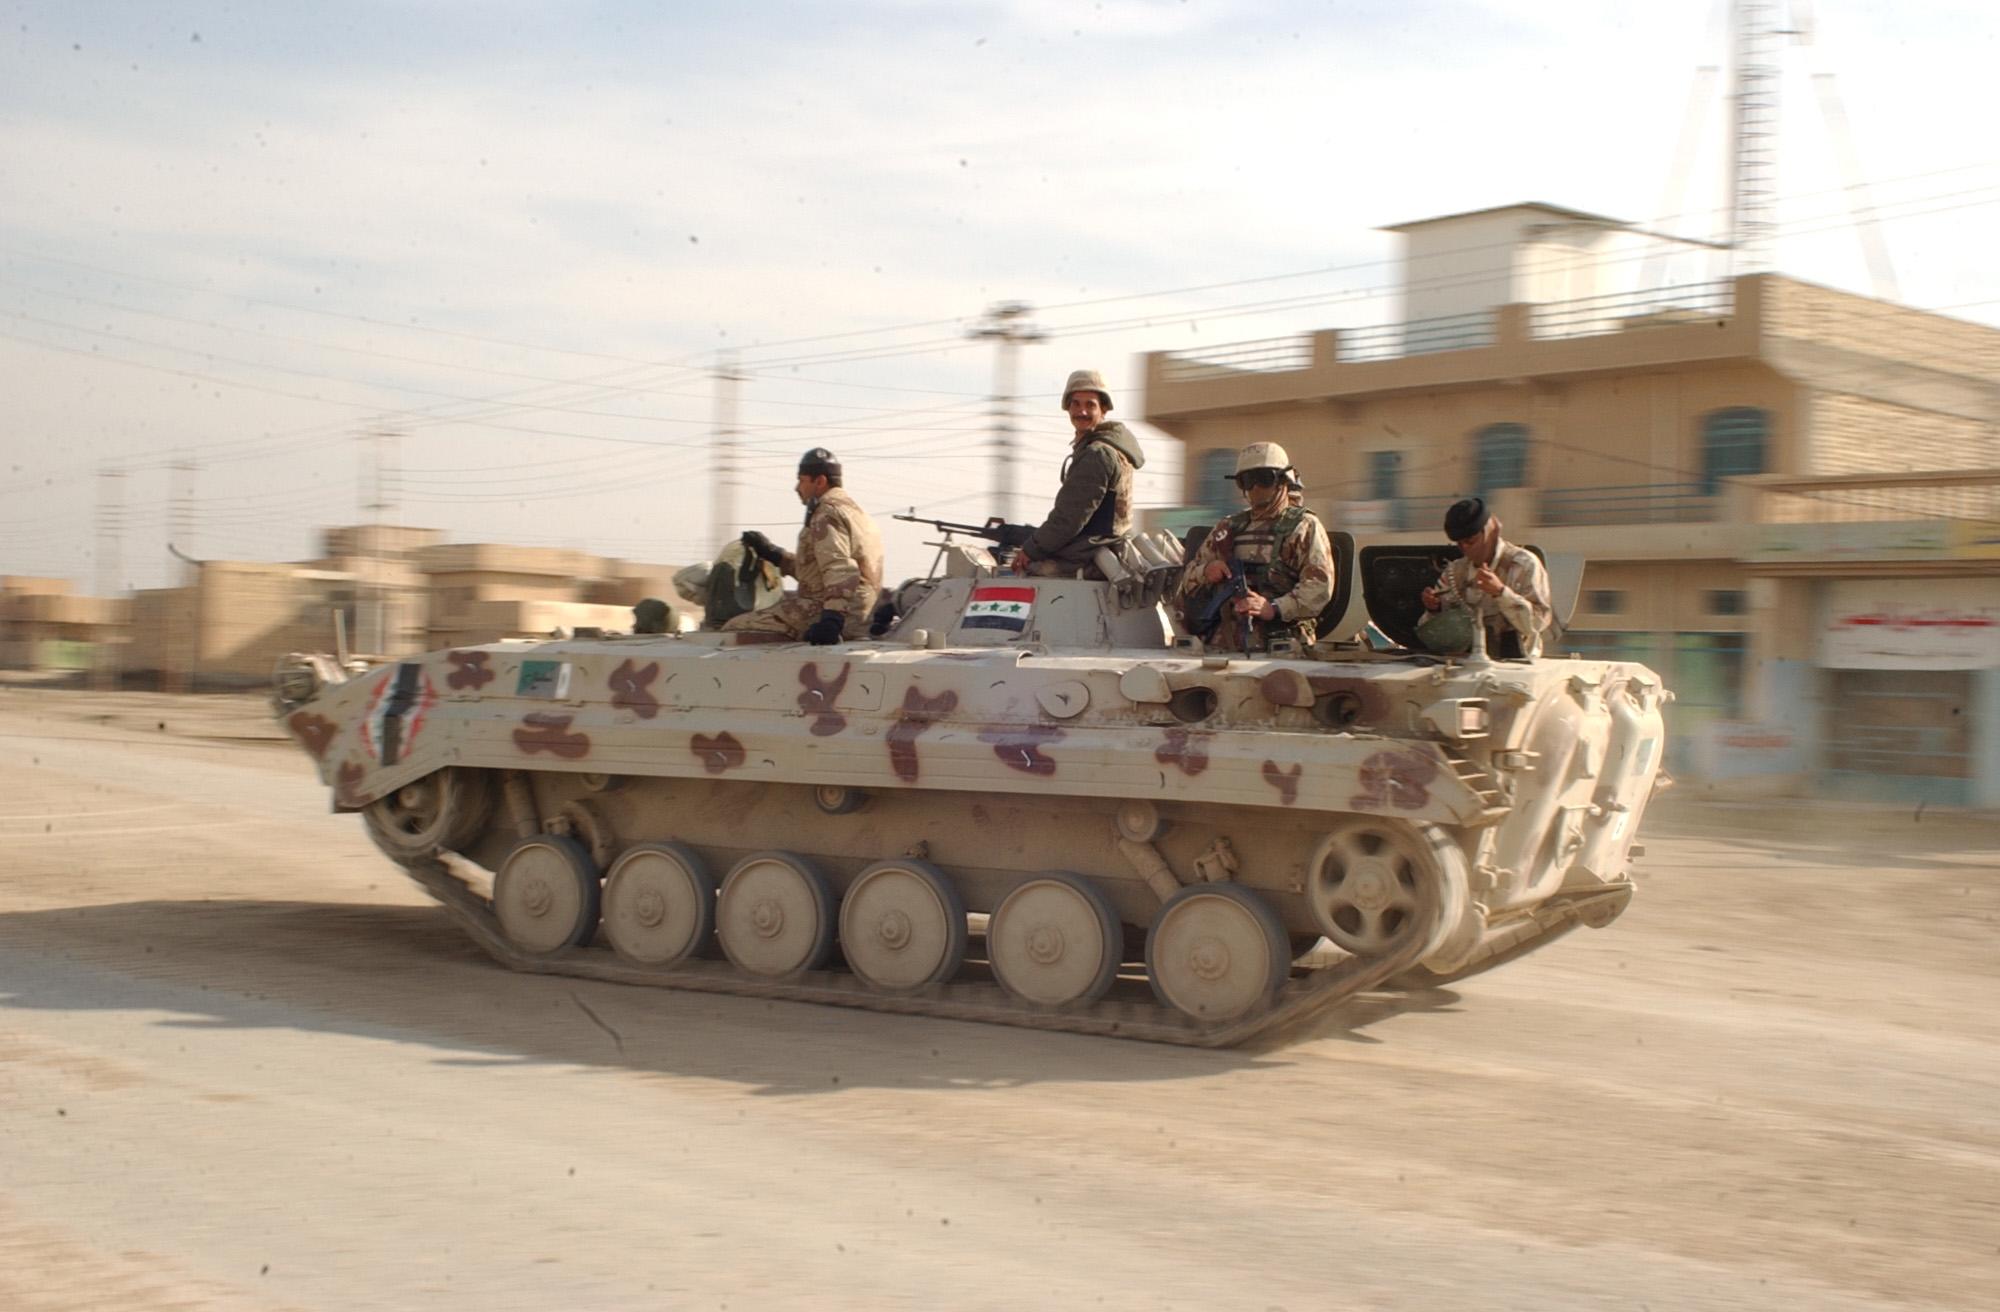 L'esercito irakeno oggi (fonte foto: Wikipedia)